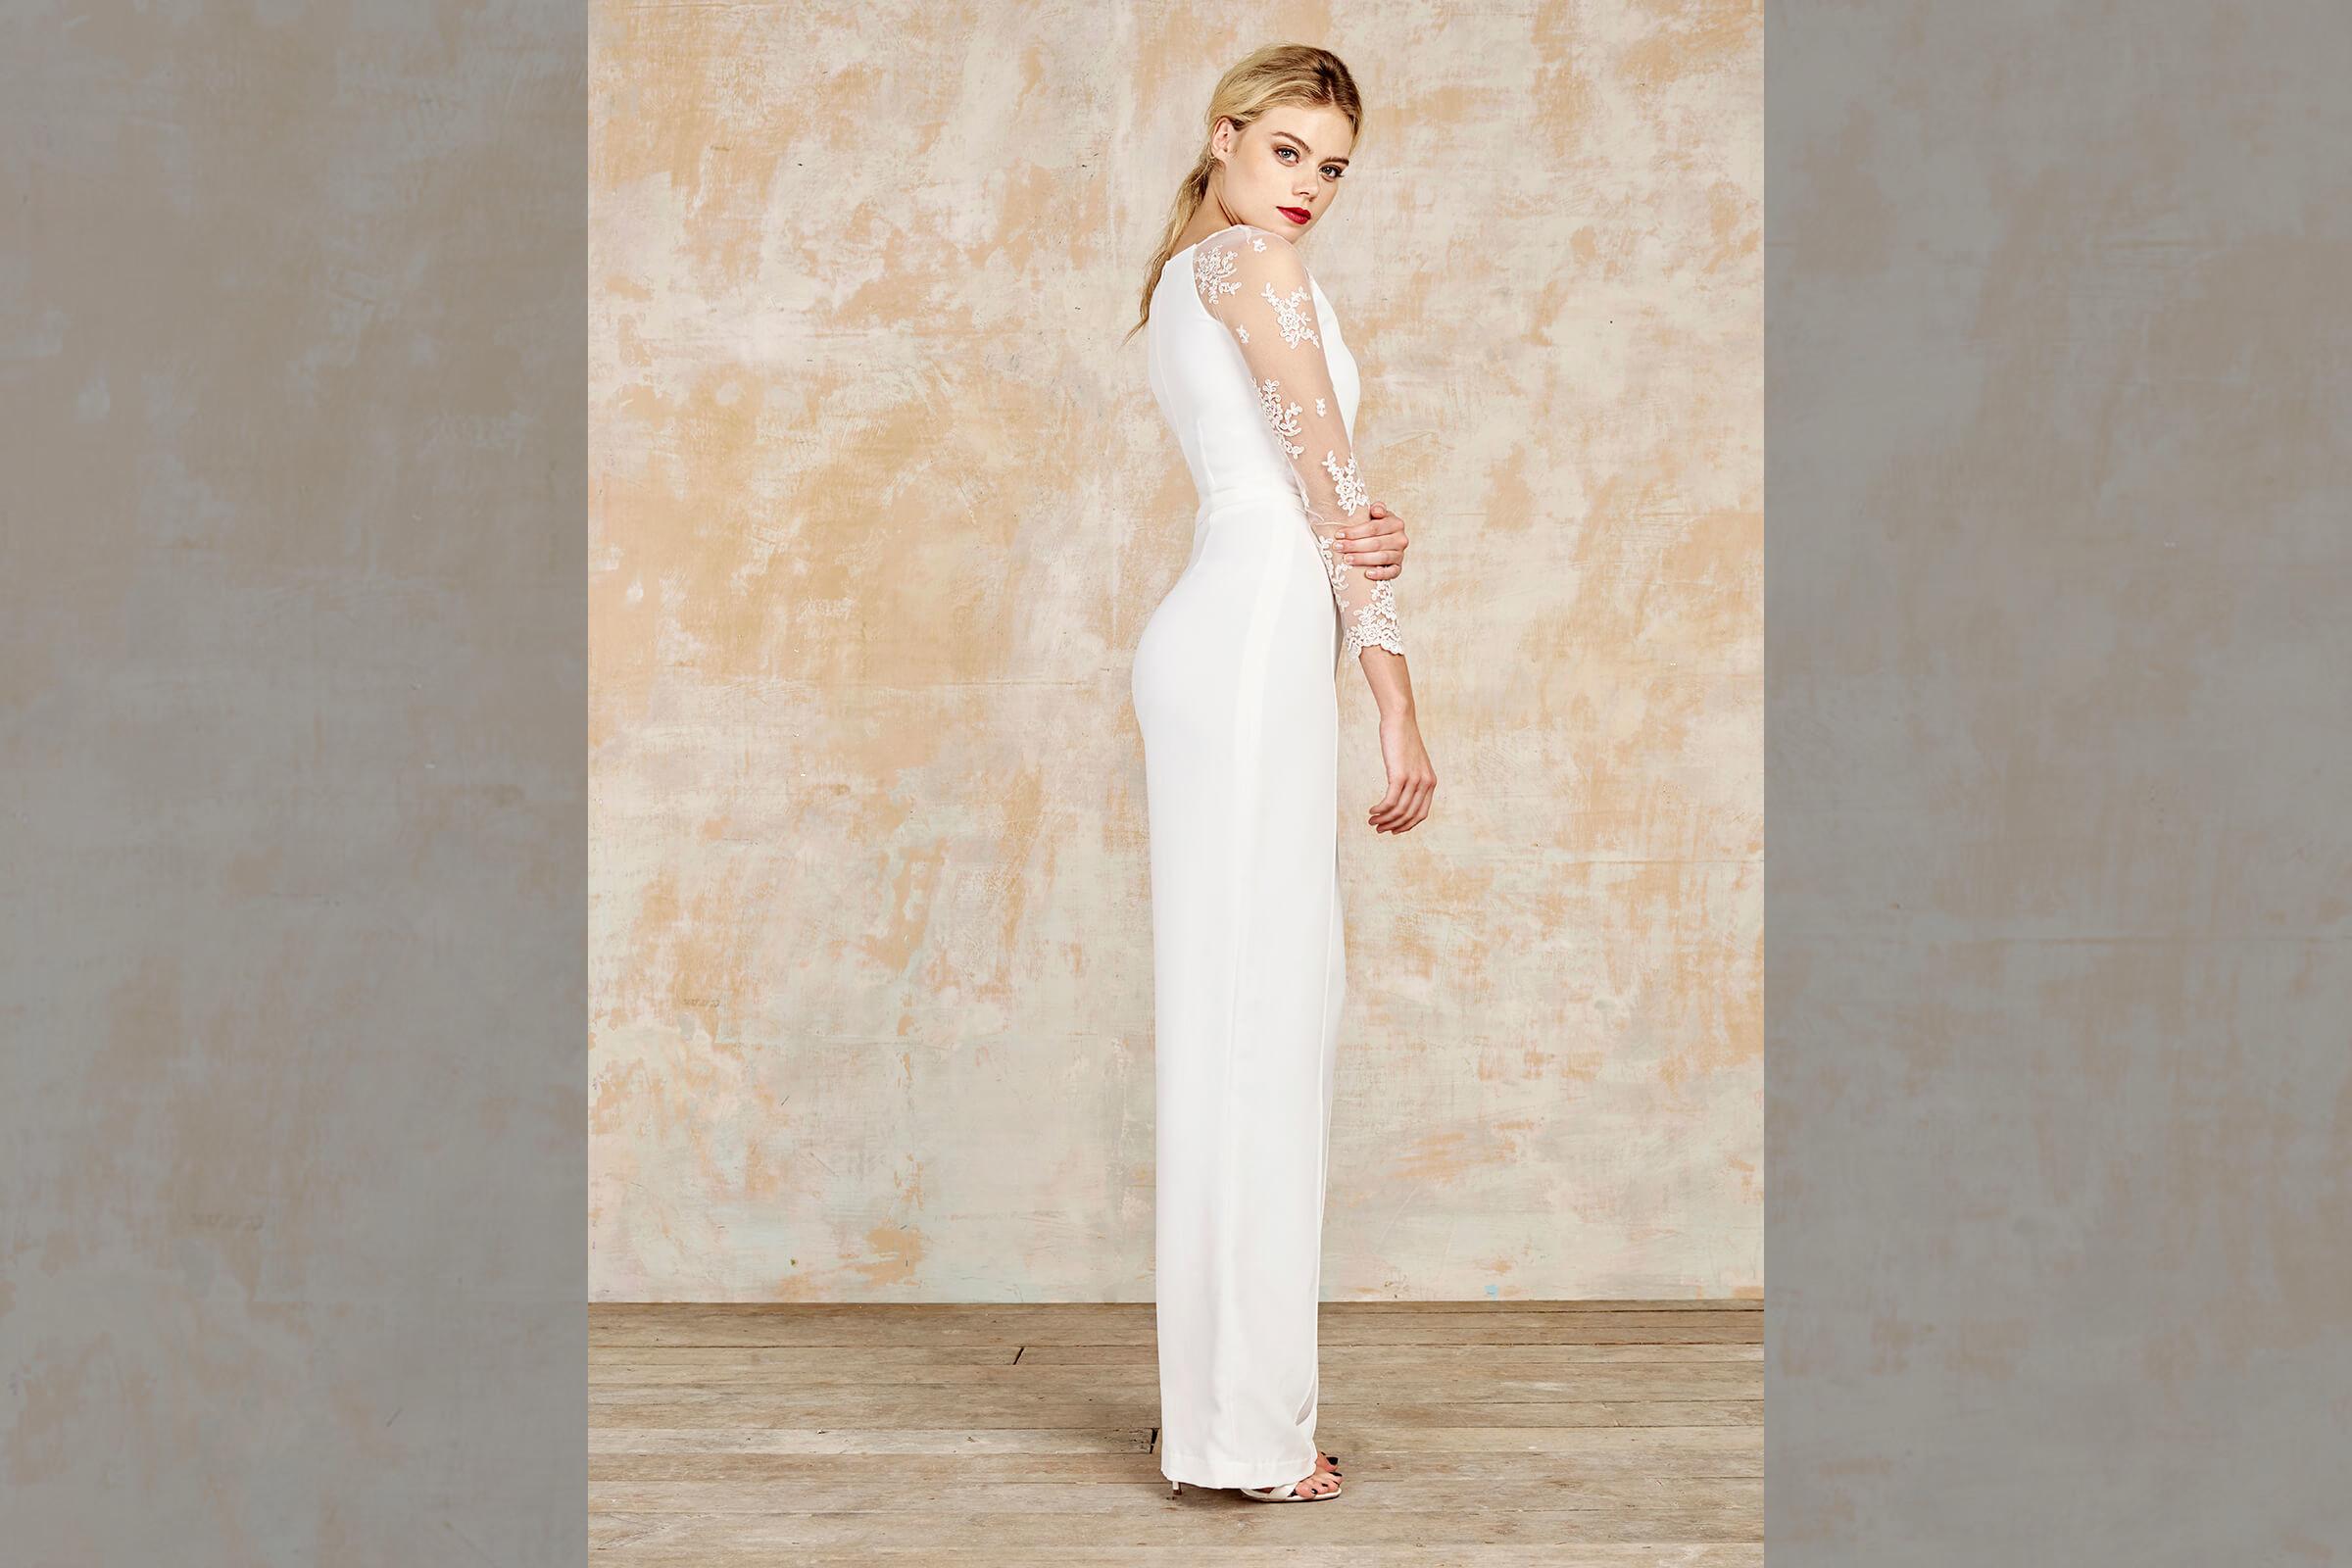 bridebook.co.uk house of ollichon white jumpsuit